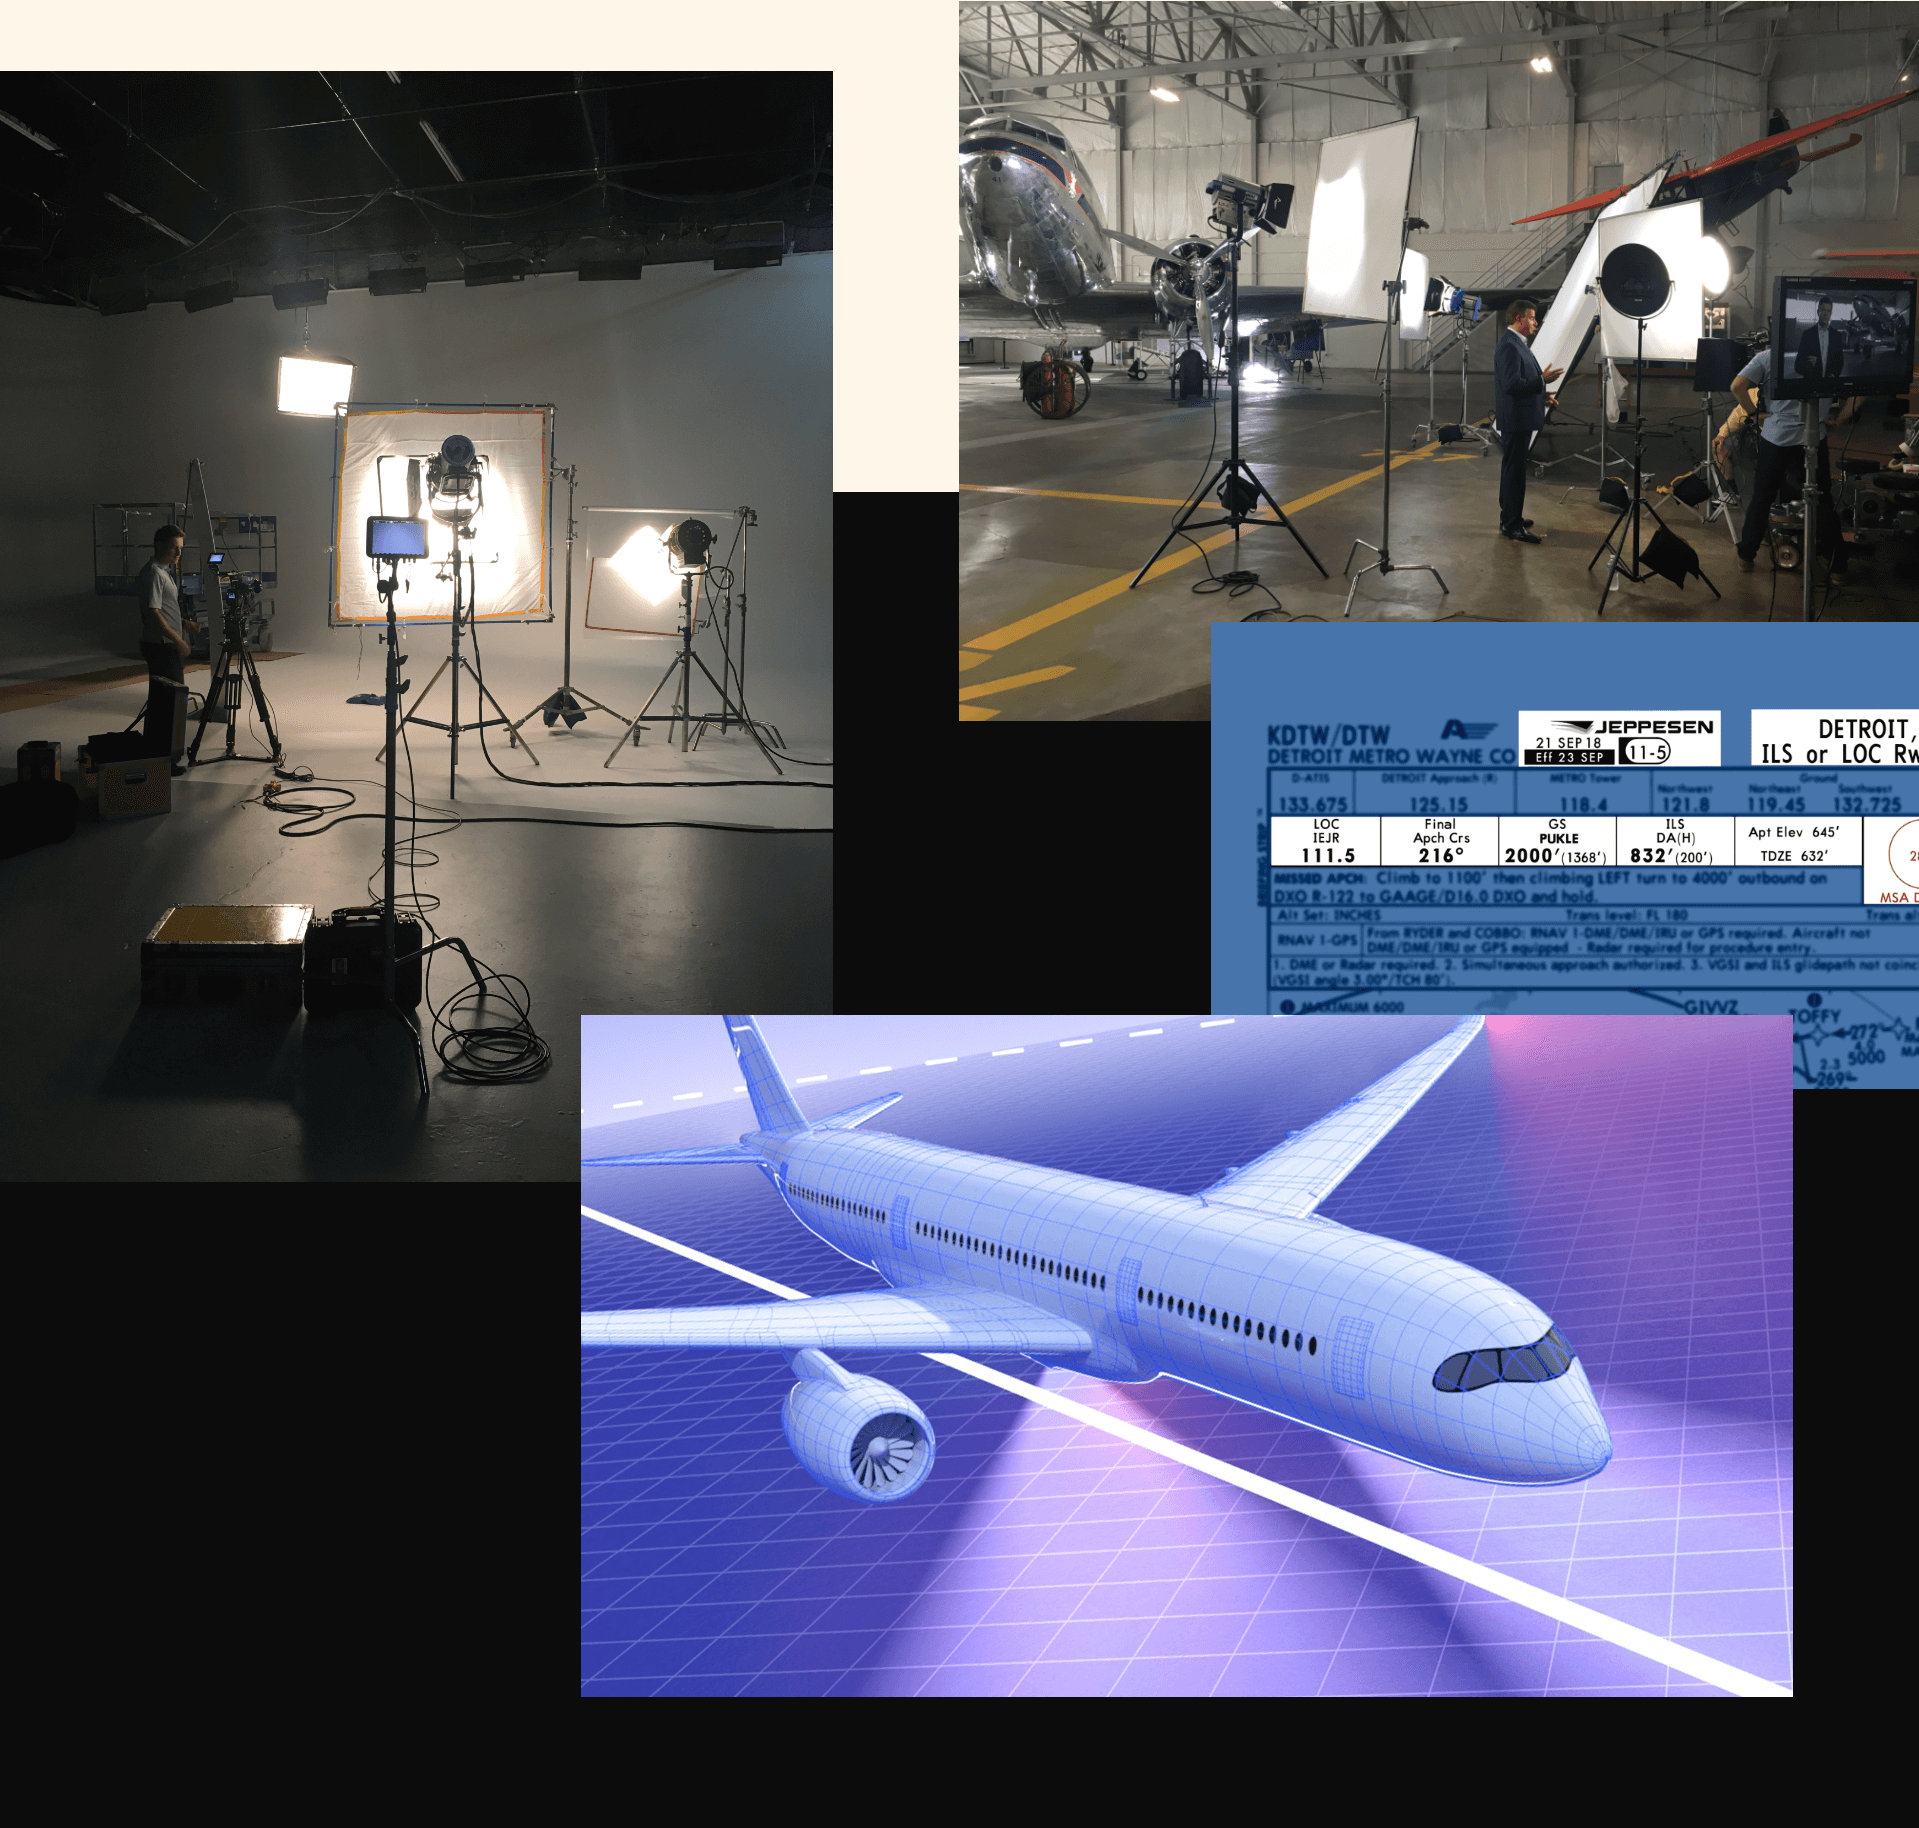 Delta eBrief Case Study Screenshots